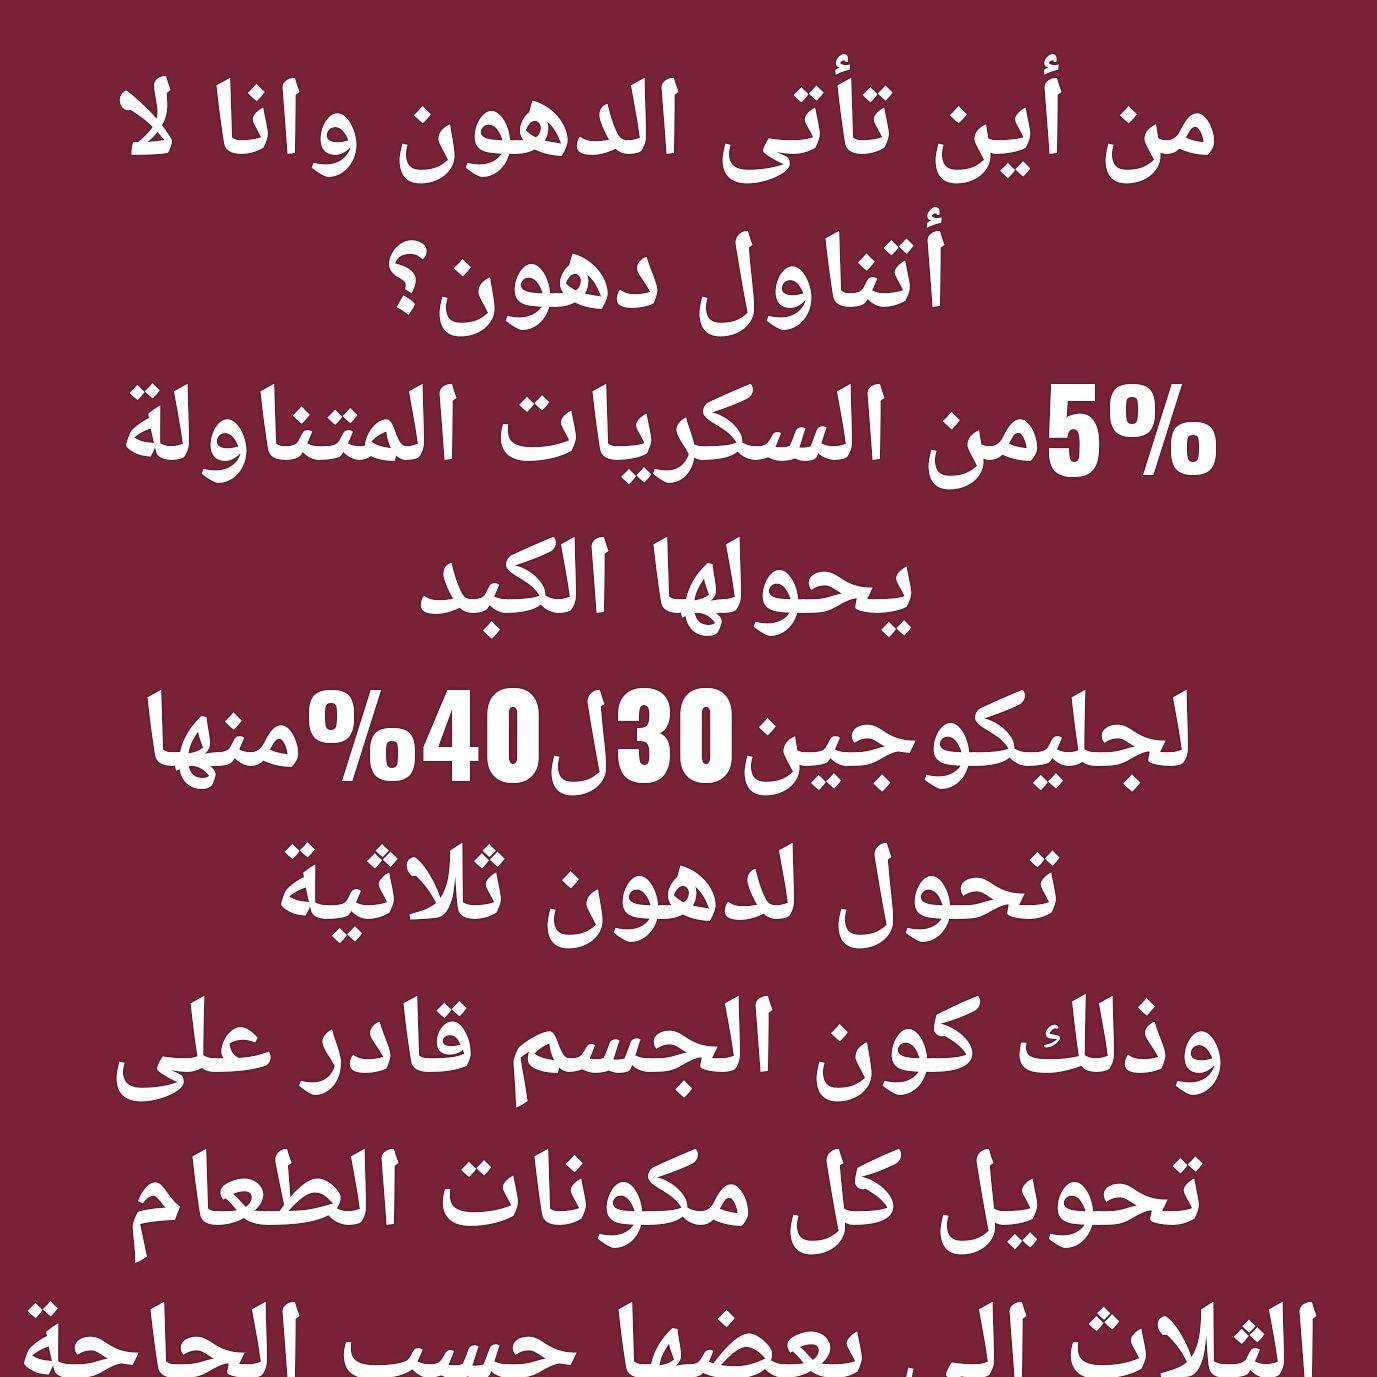 Pin By Dr Mohammed Abdelsalam On دايت كير في سلطنة ع مان Diet Care Math Arabic Calligraphy Calligraphy